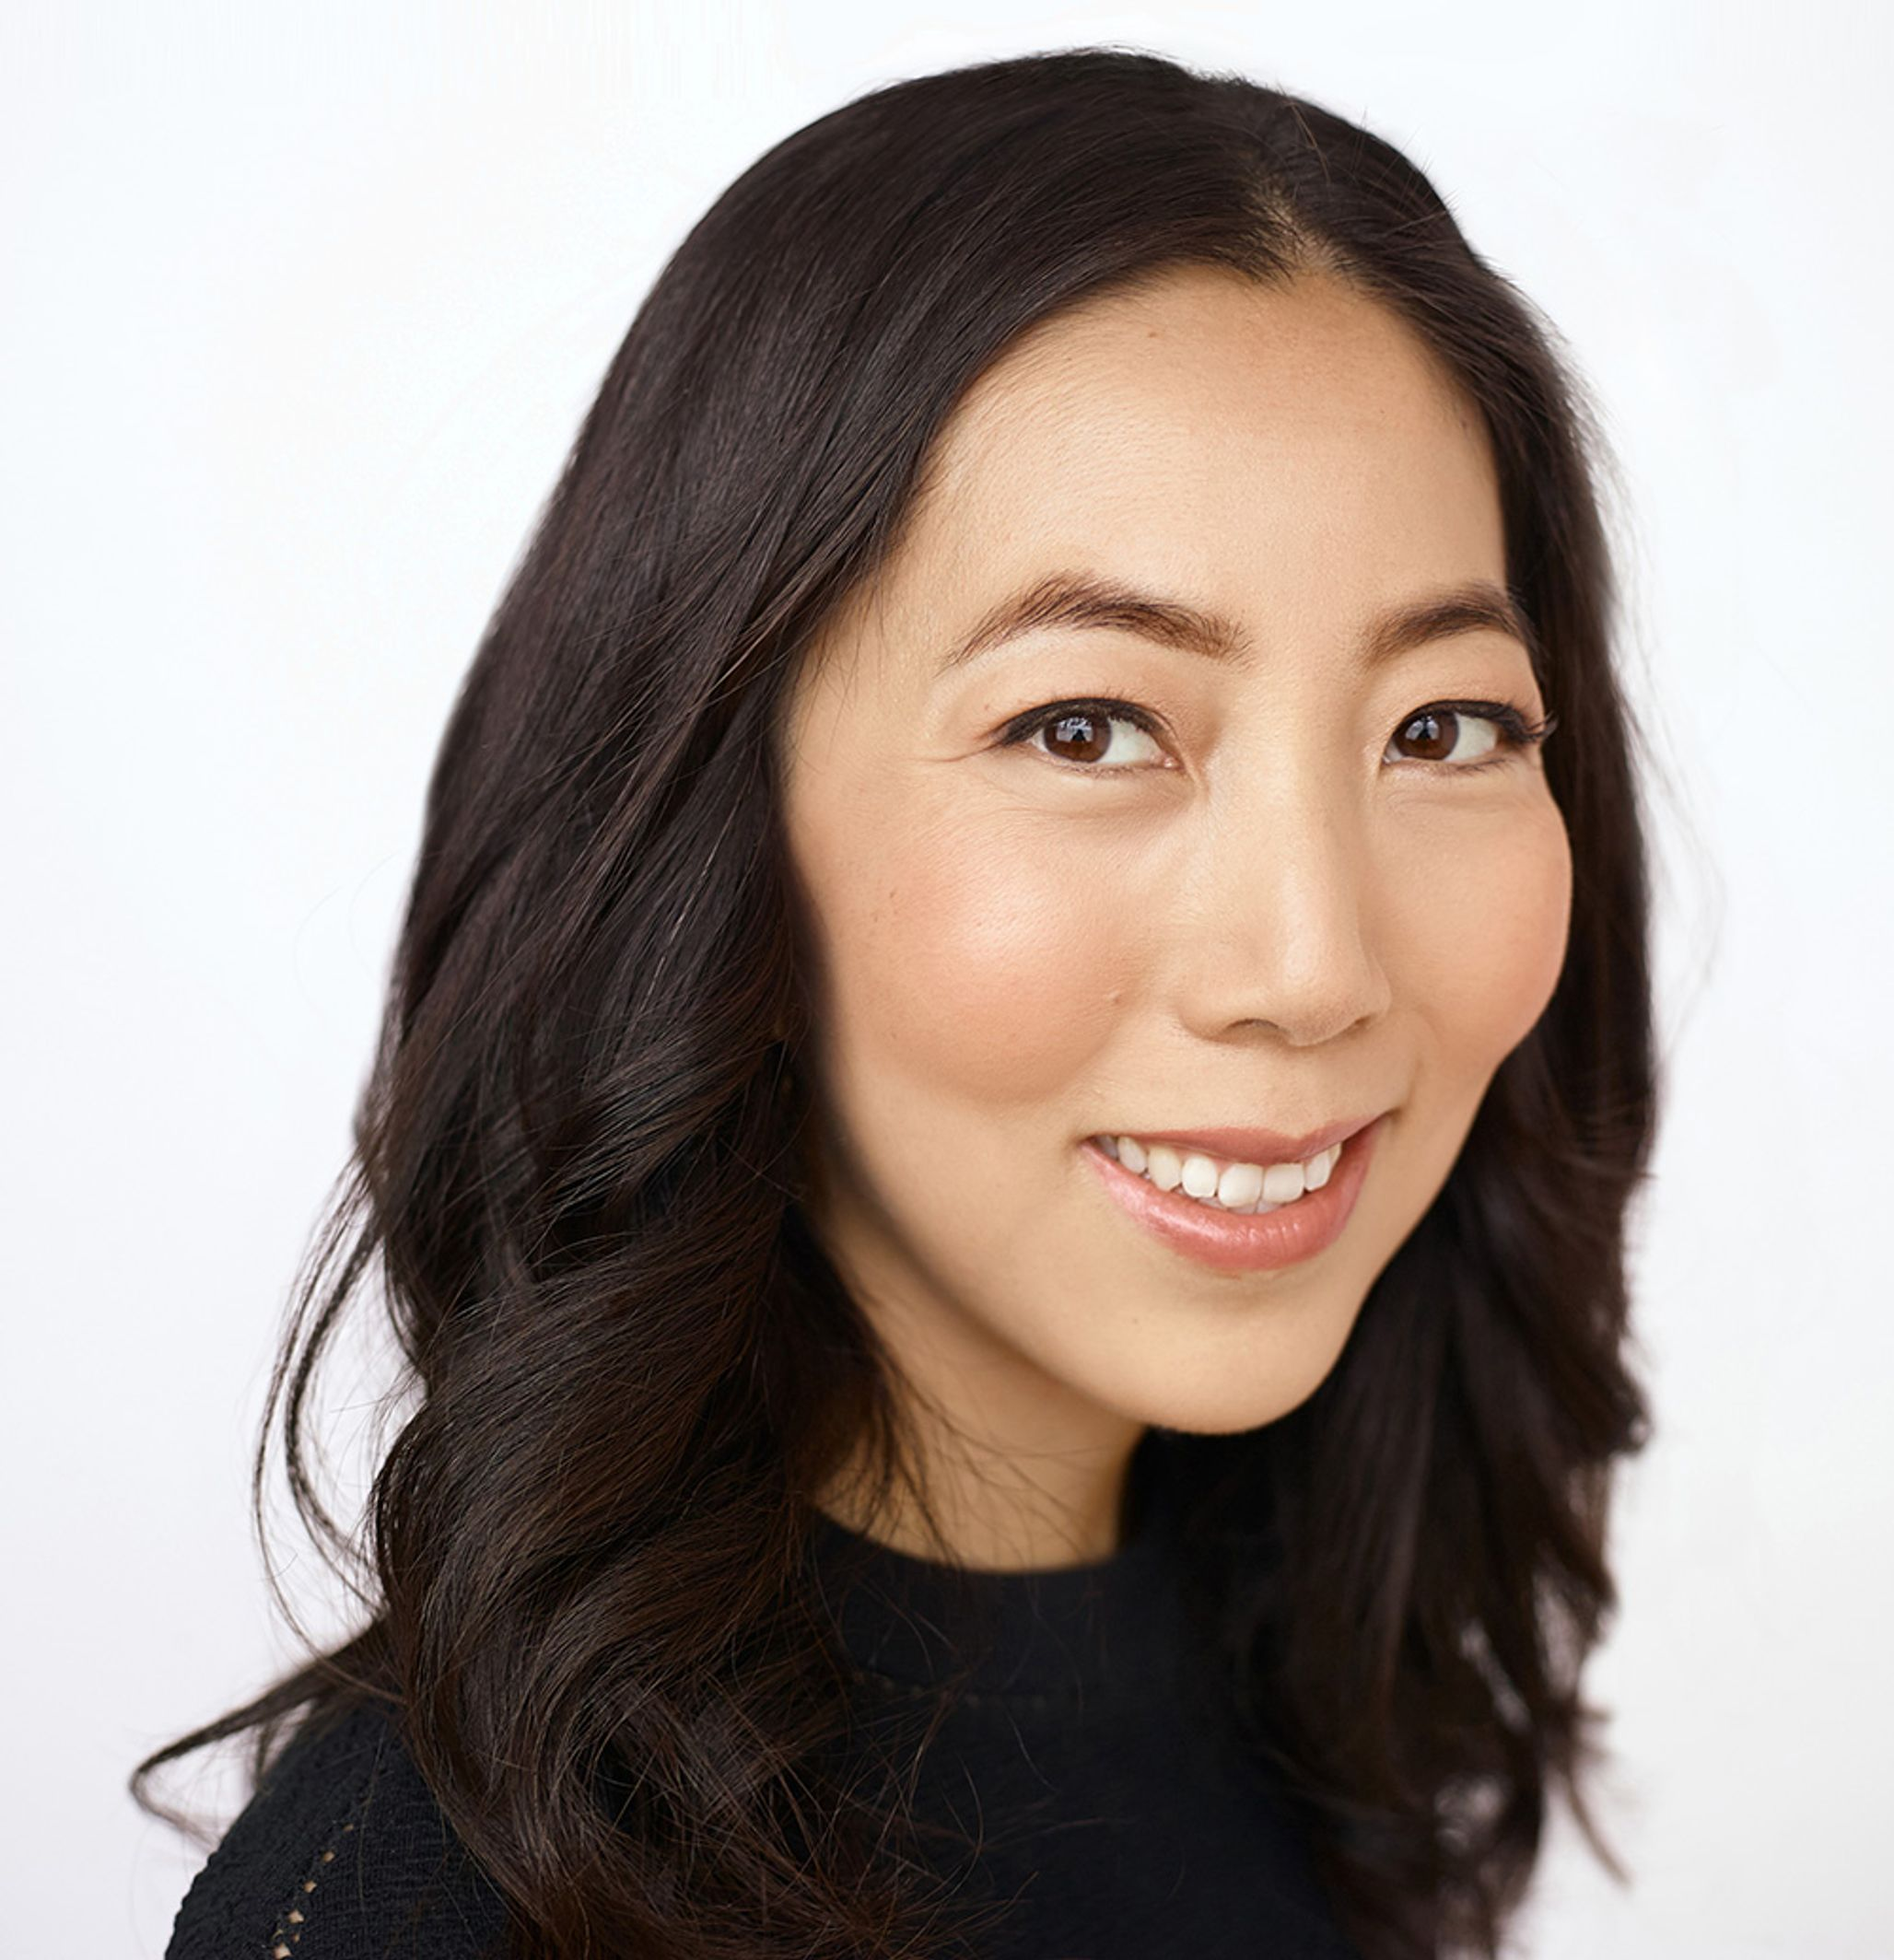 Photo of Julie Zhuo